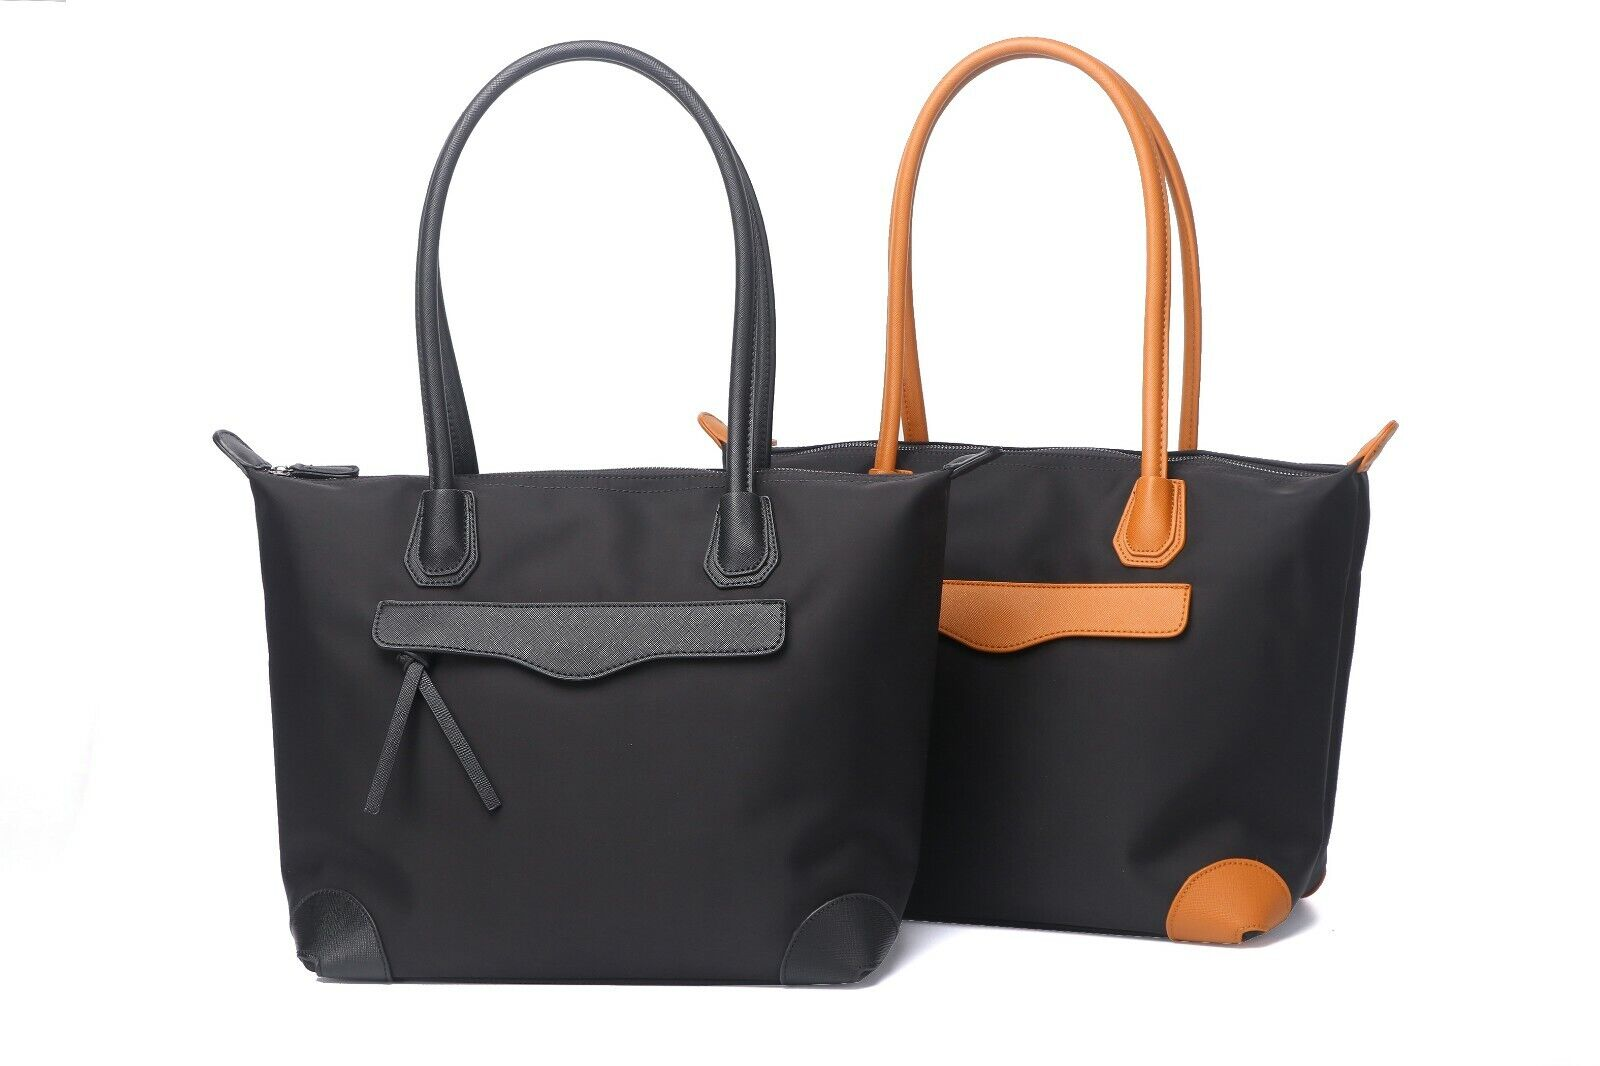 Jeelow Work Tote Shoulder Bag Lightweight Oxford Nylon Handb